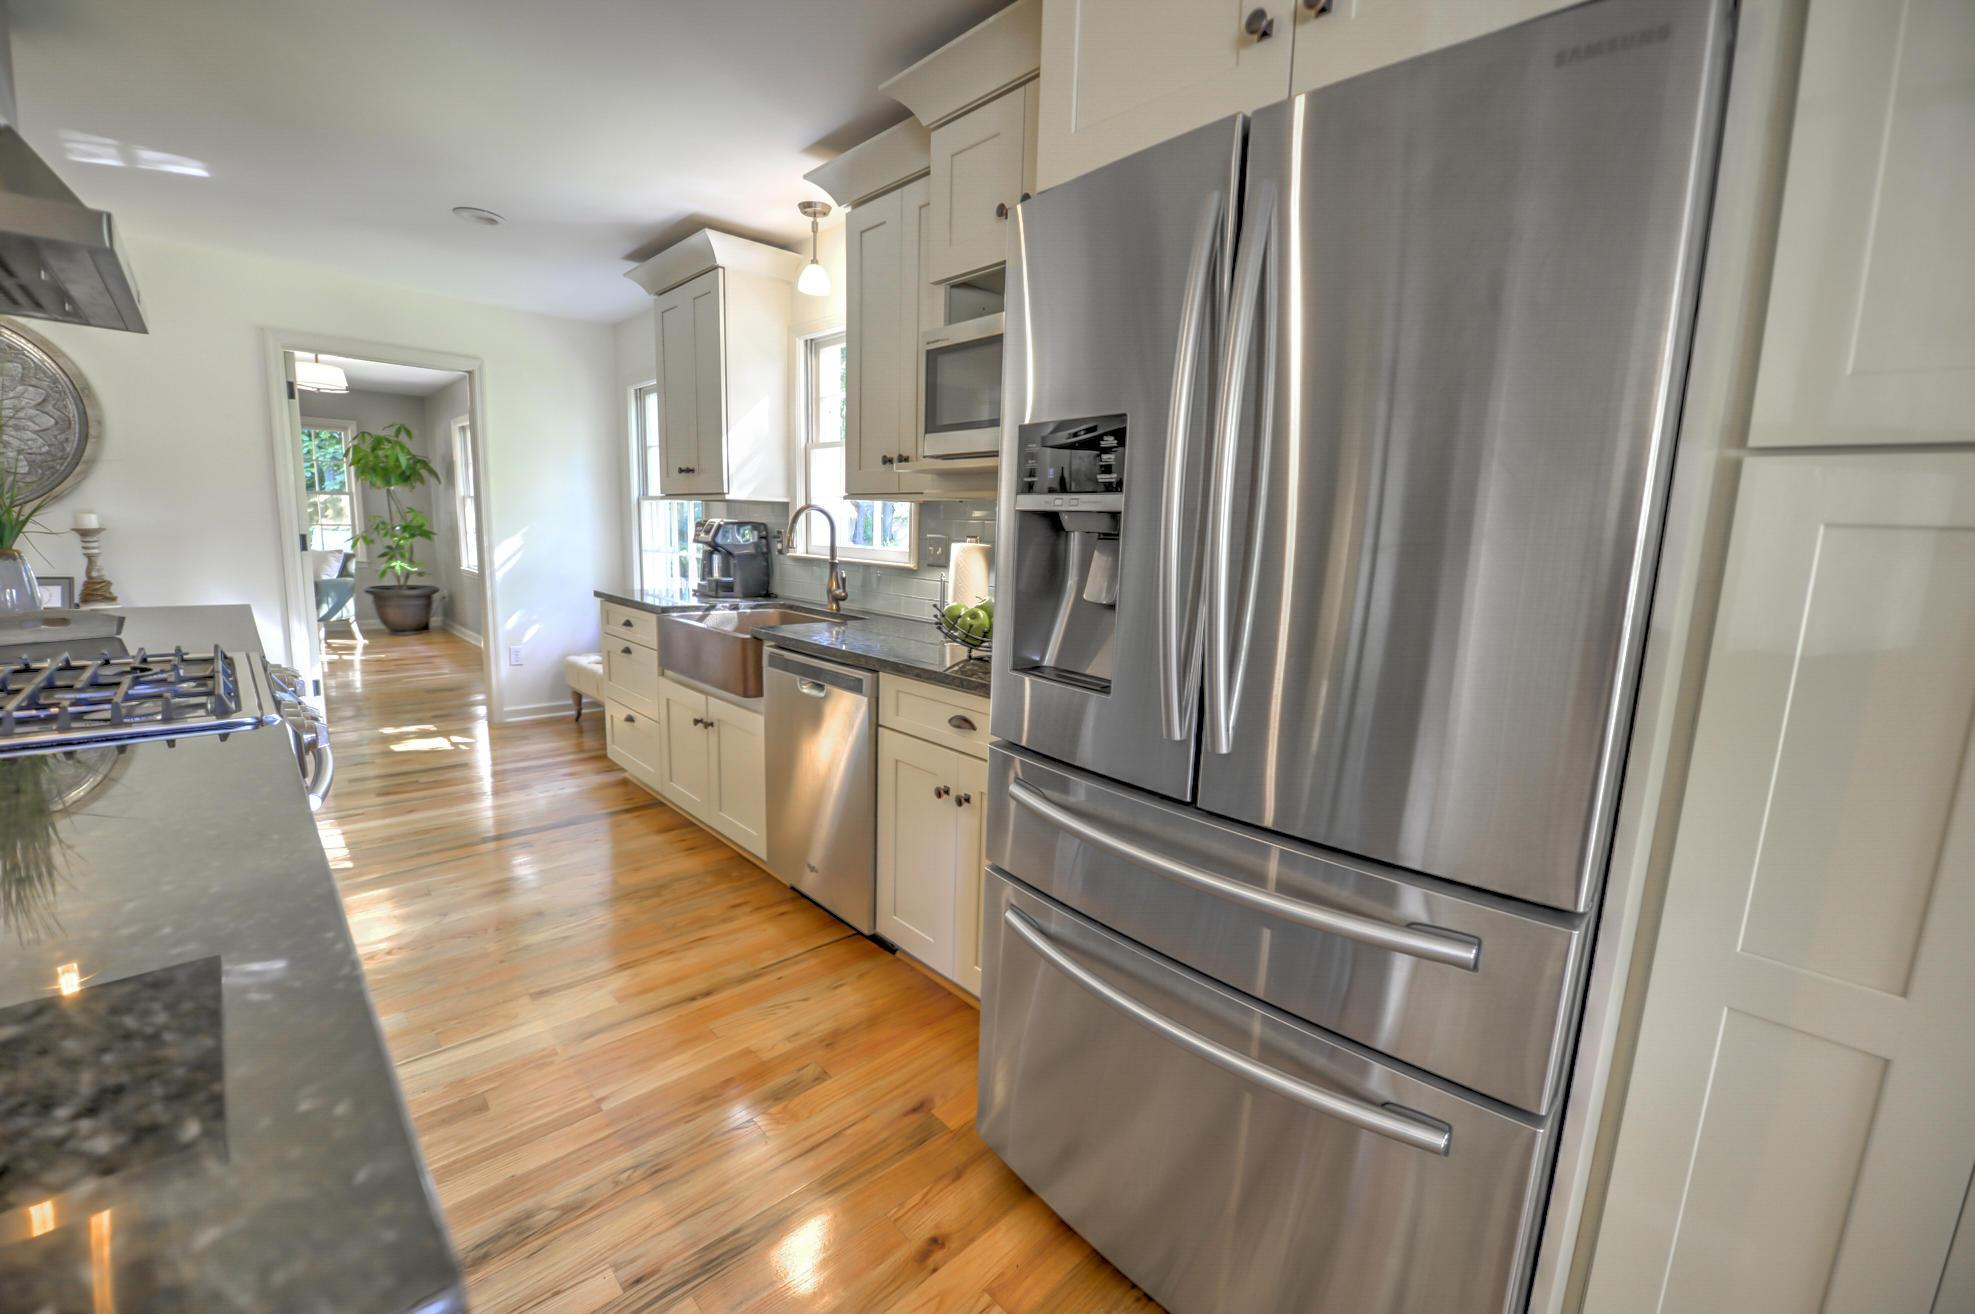 Shemwood II Homes For Sale - 1017 Jack Snipe, Mount Pleasant, SC - 17